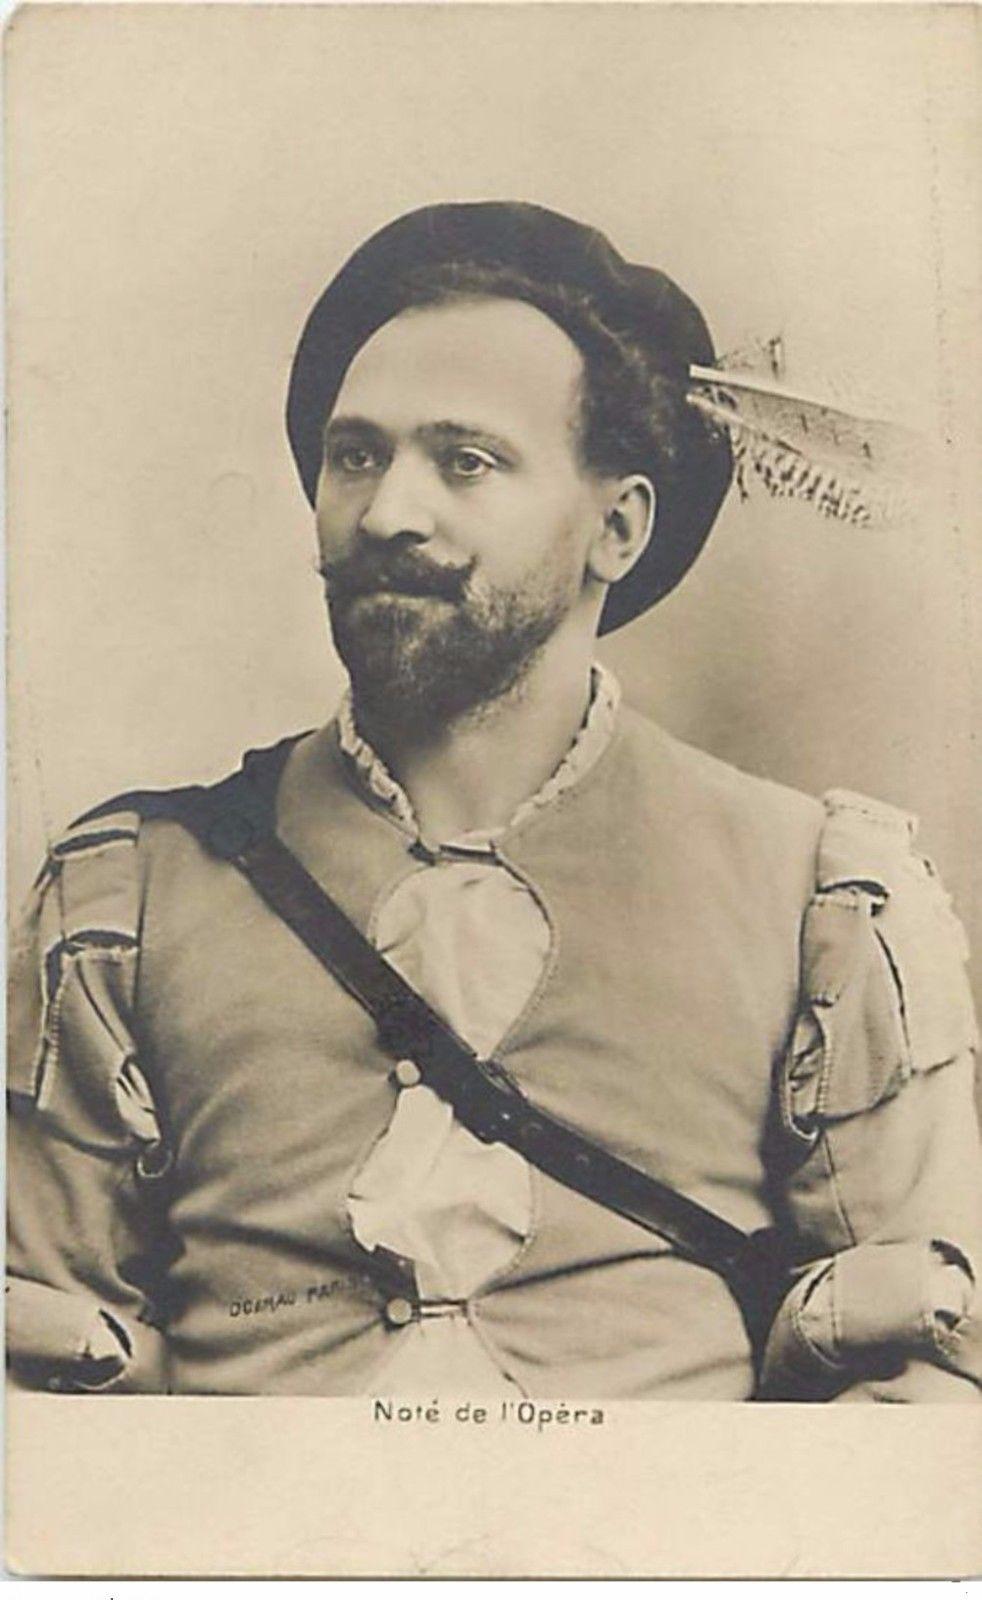 BELGIAN BARITONE JEAN NOTÉ (1859-1922) CD